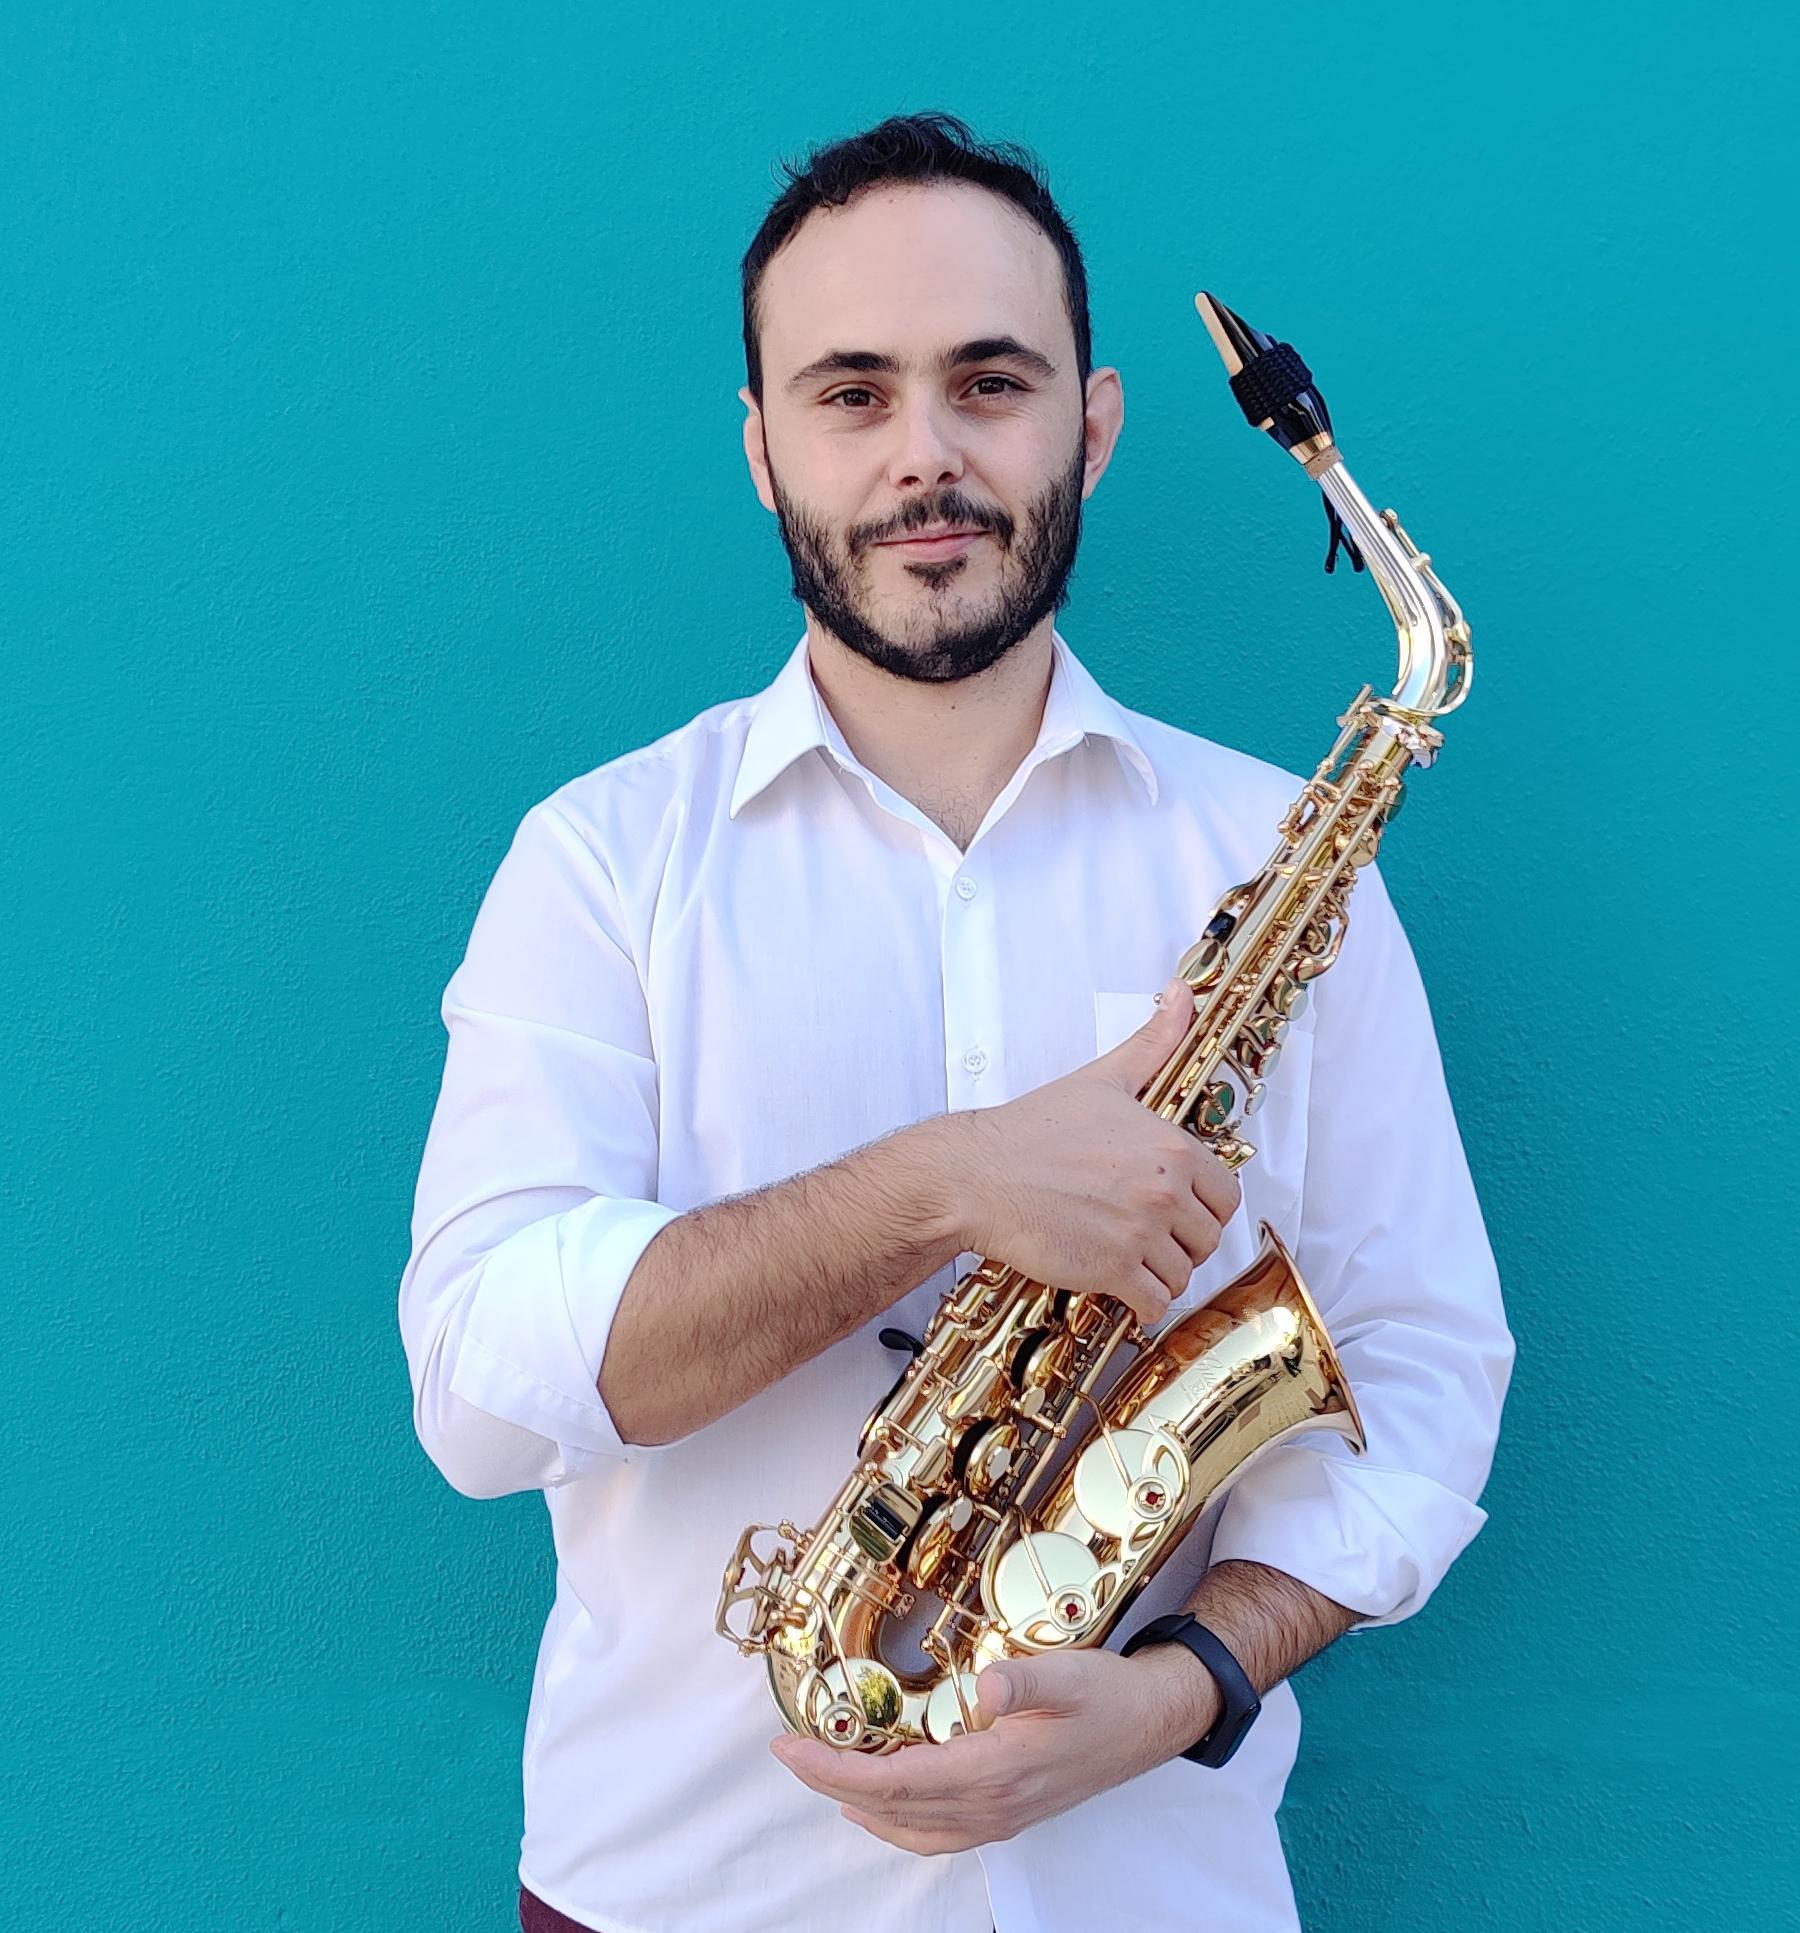 Adrian-Ruiz-Sánchez-profesor triarte